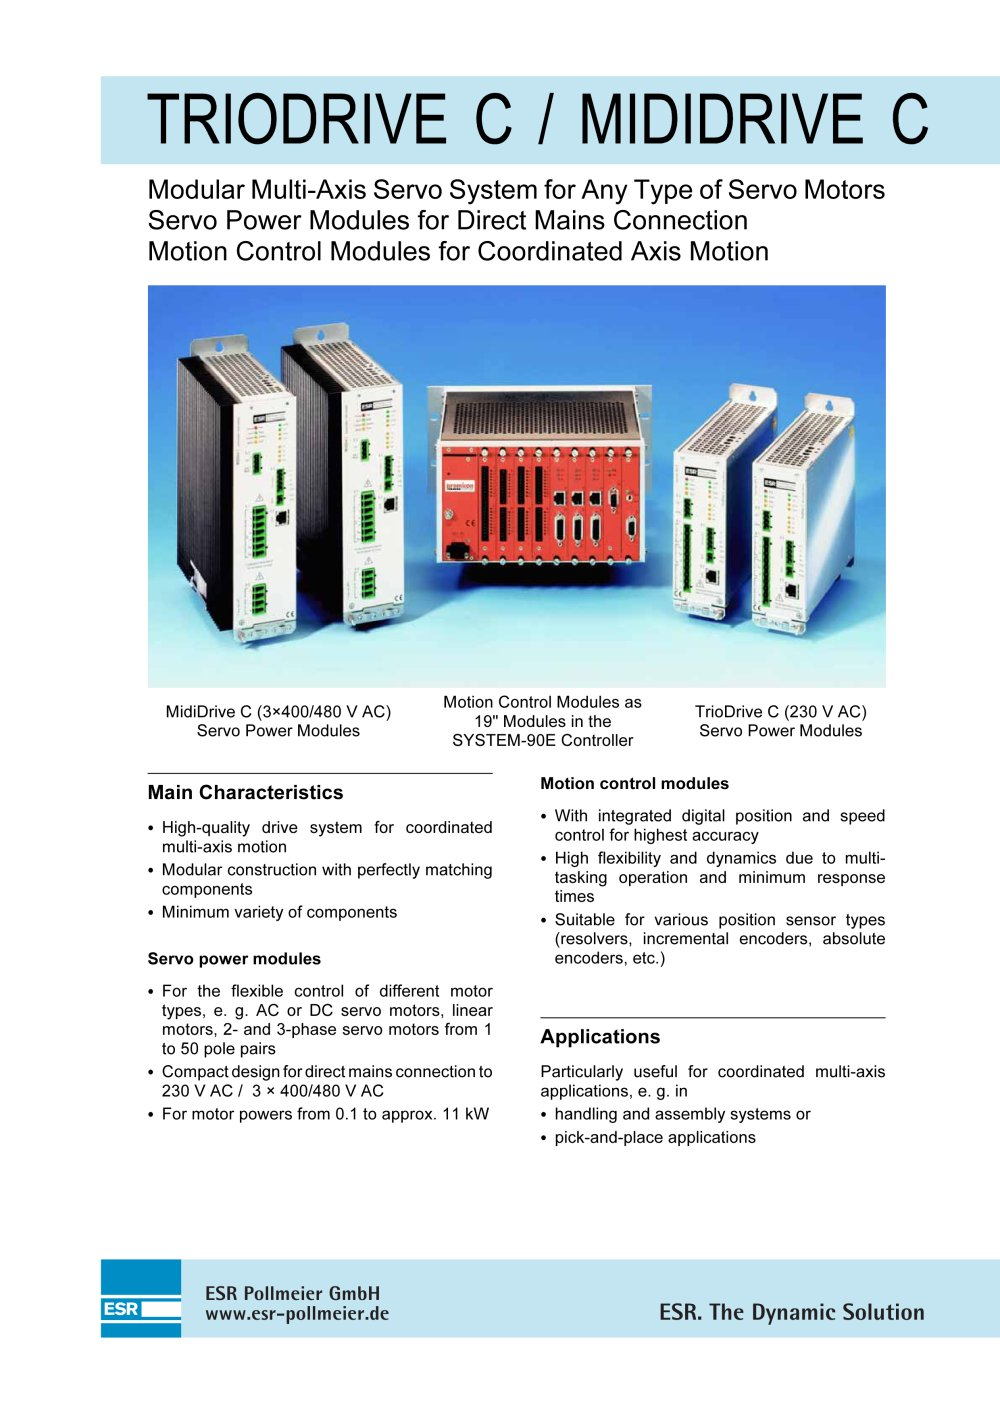 TrioDrive C / MidiDrive C - ESR Pollmeier - PDF Catalogue ...